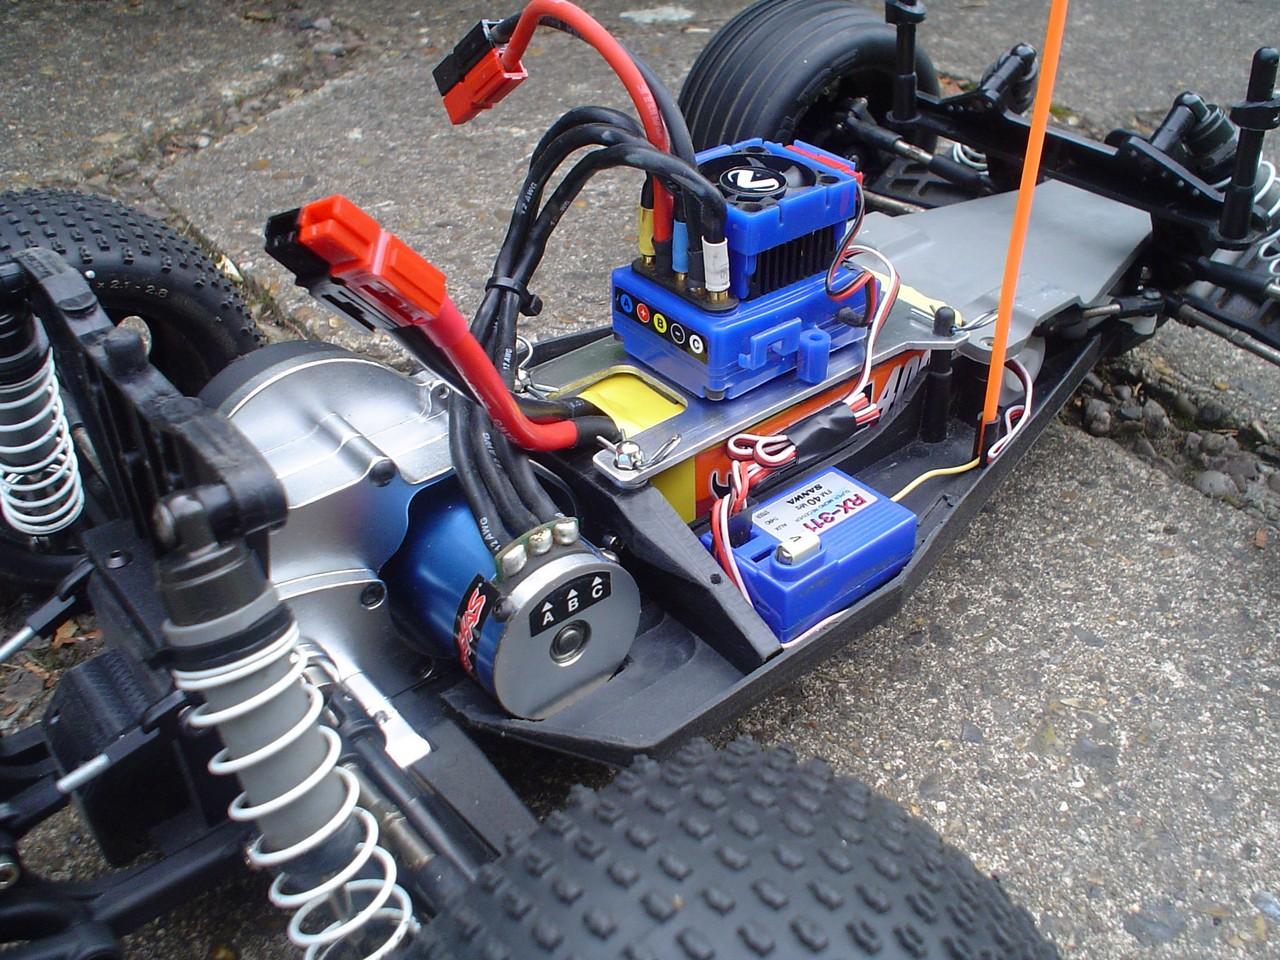 Rustler Vxl Video Motor And 3s Rhino Lipo